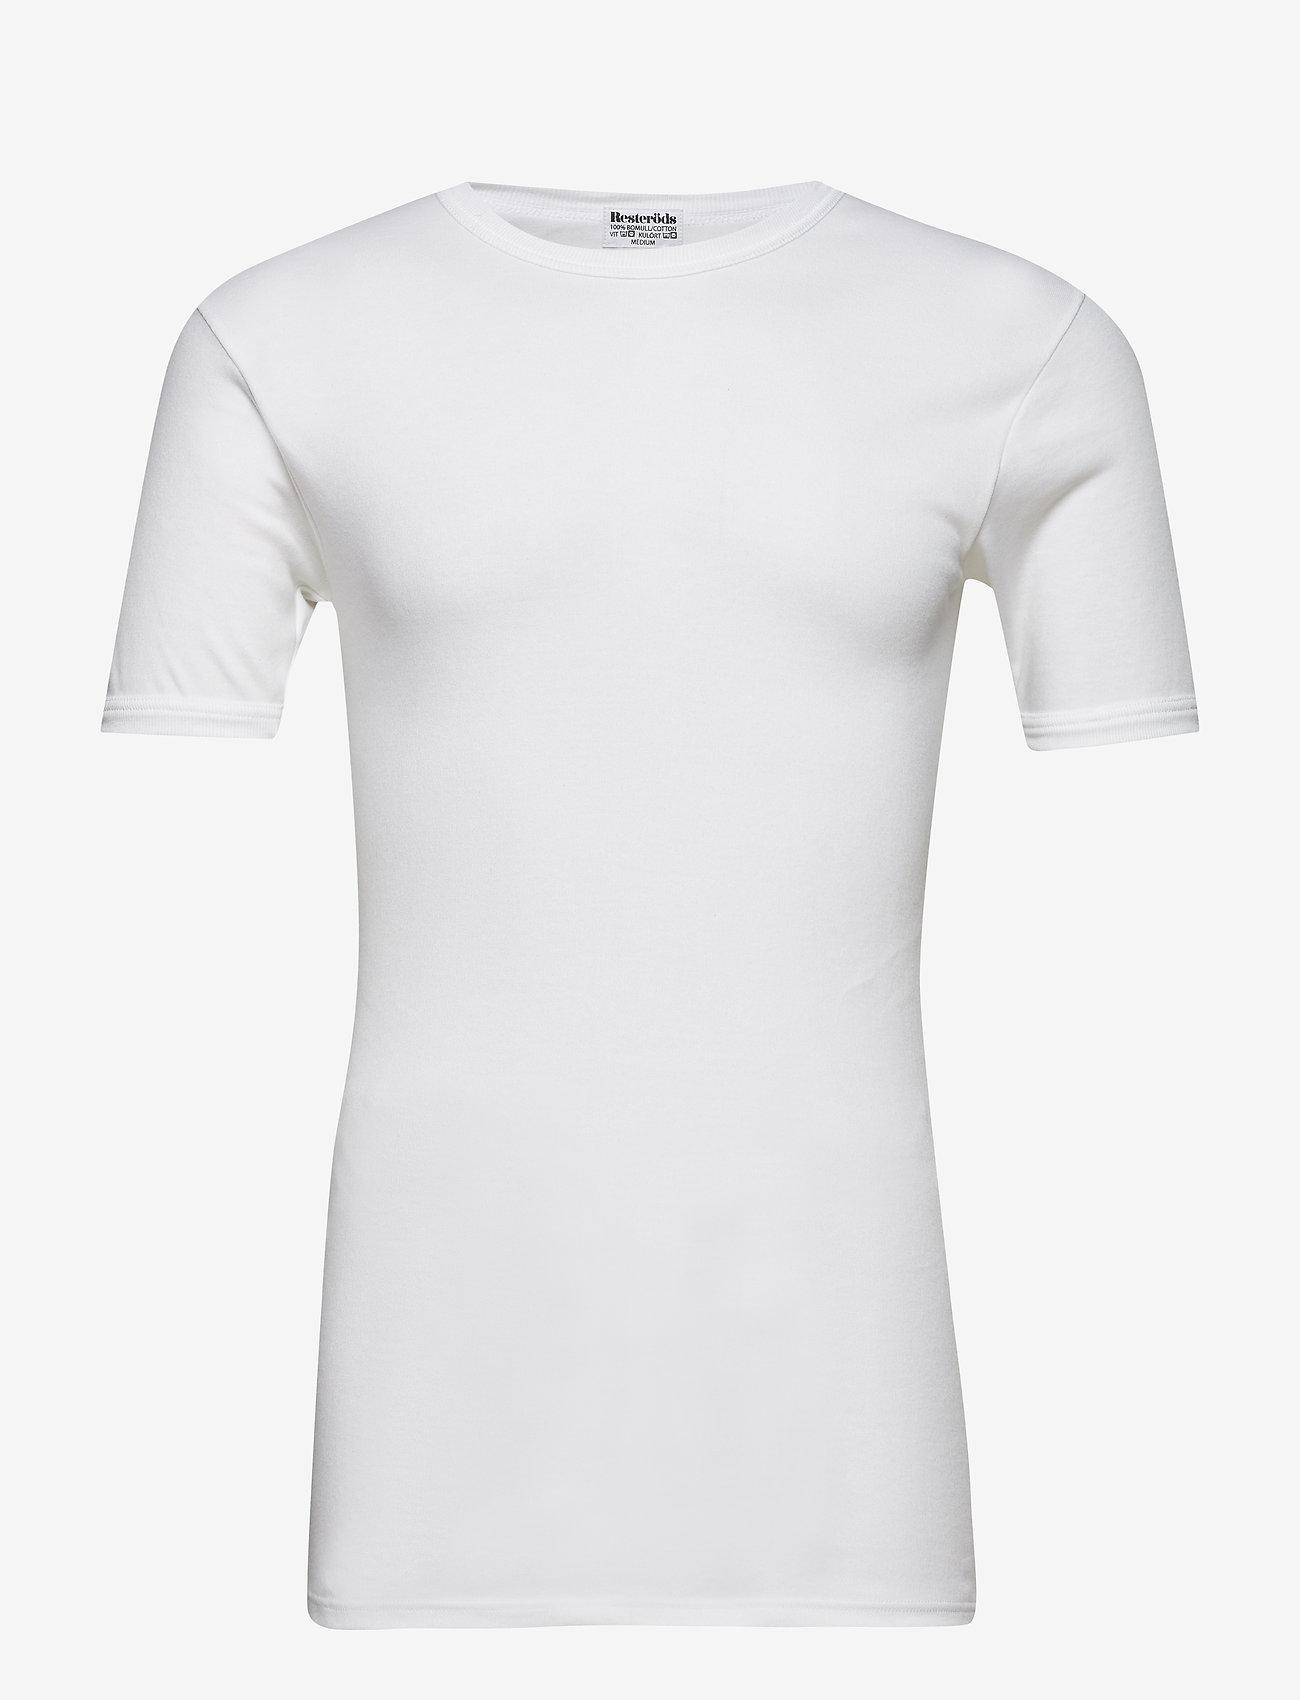 Resteröds - Tröja, kort ärm rund halsring - basic t-shirts - white